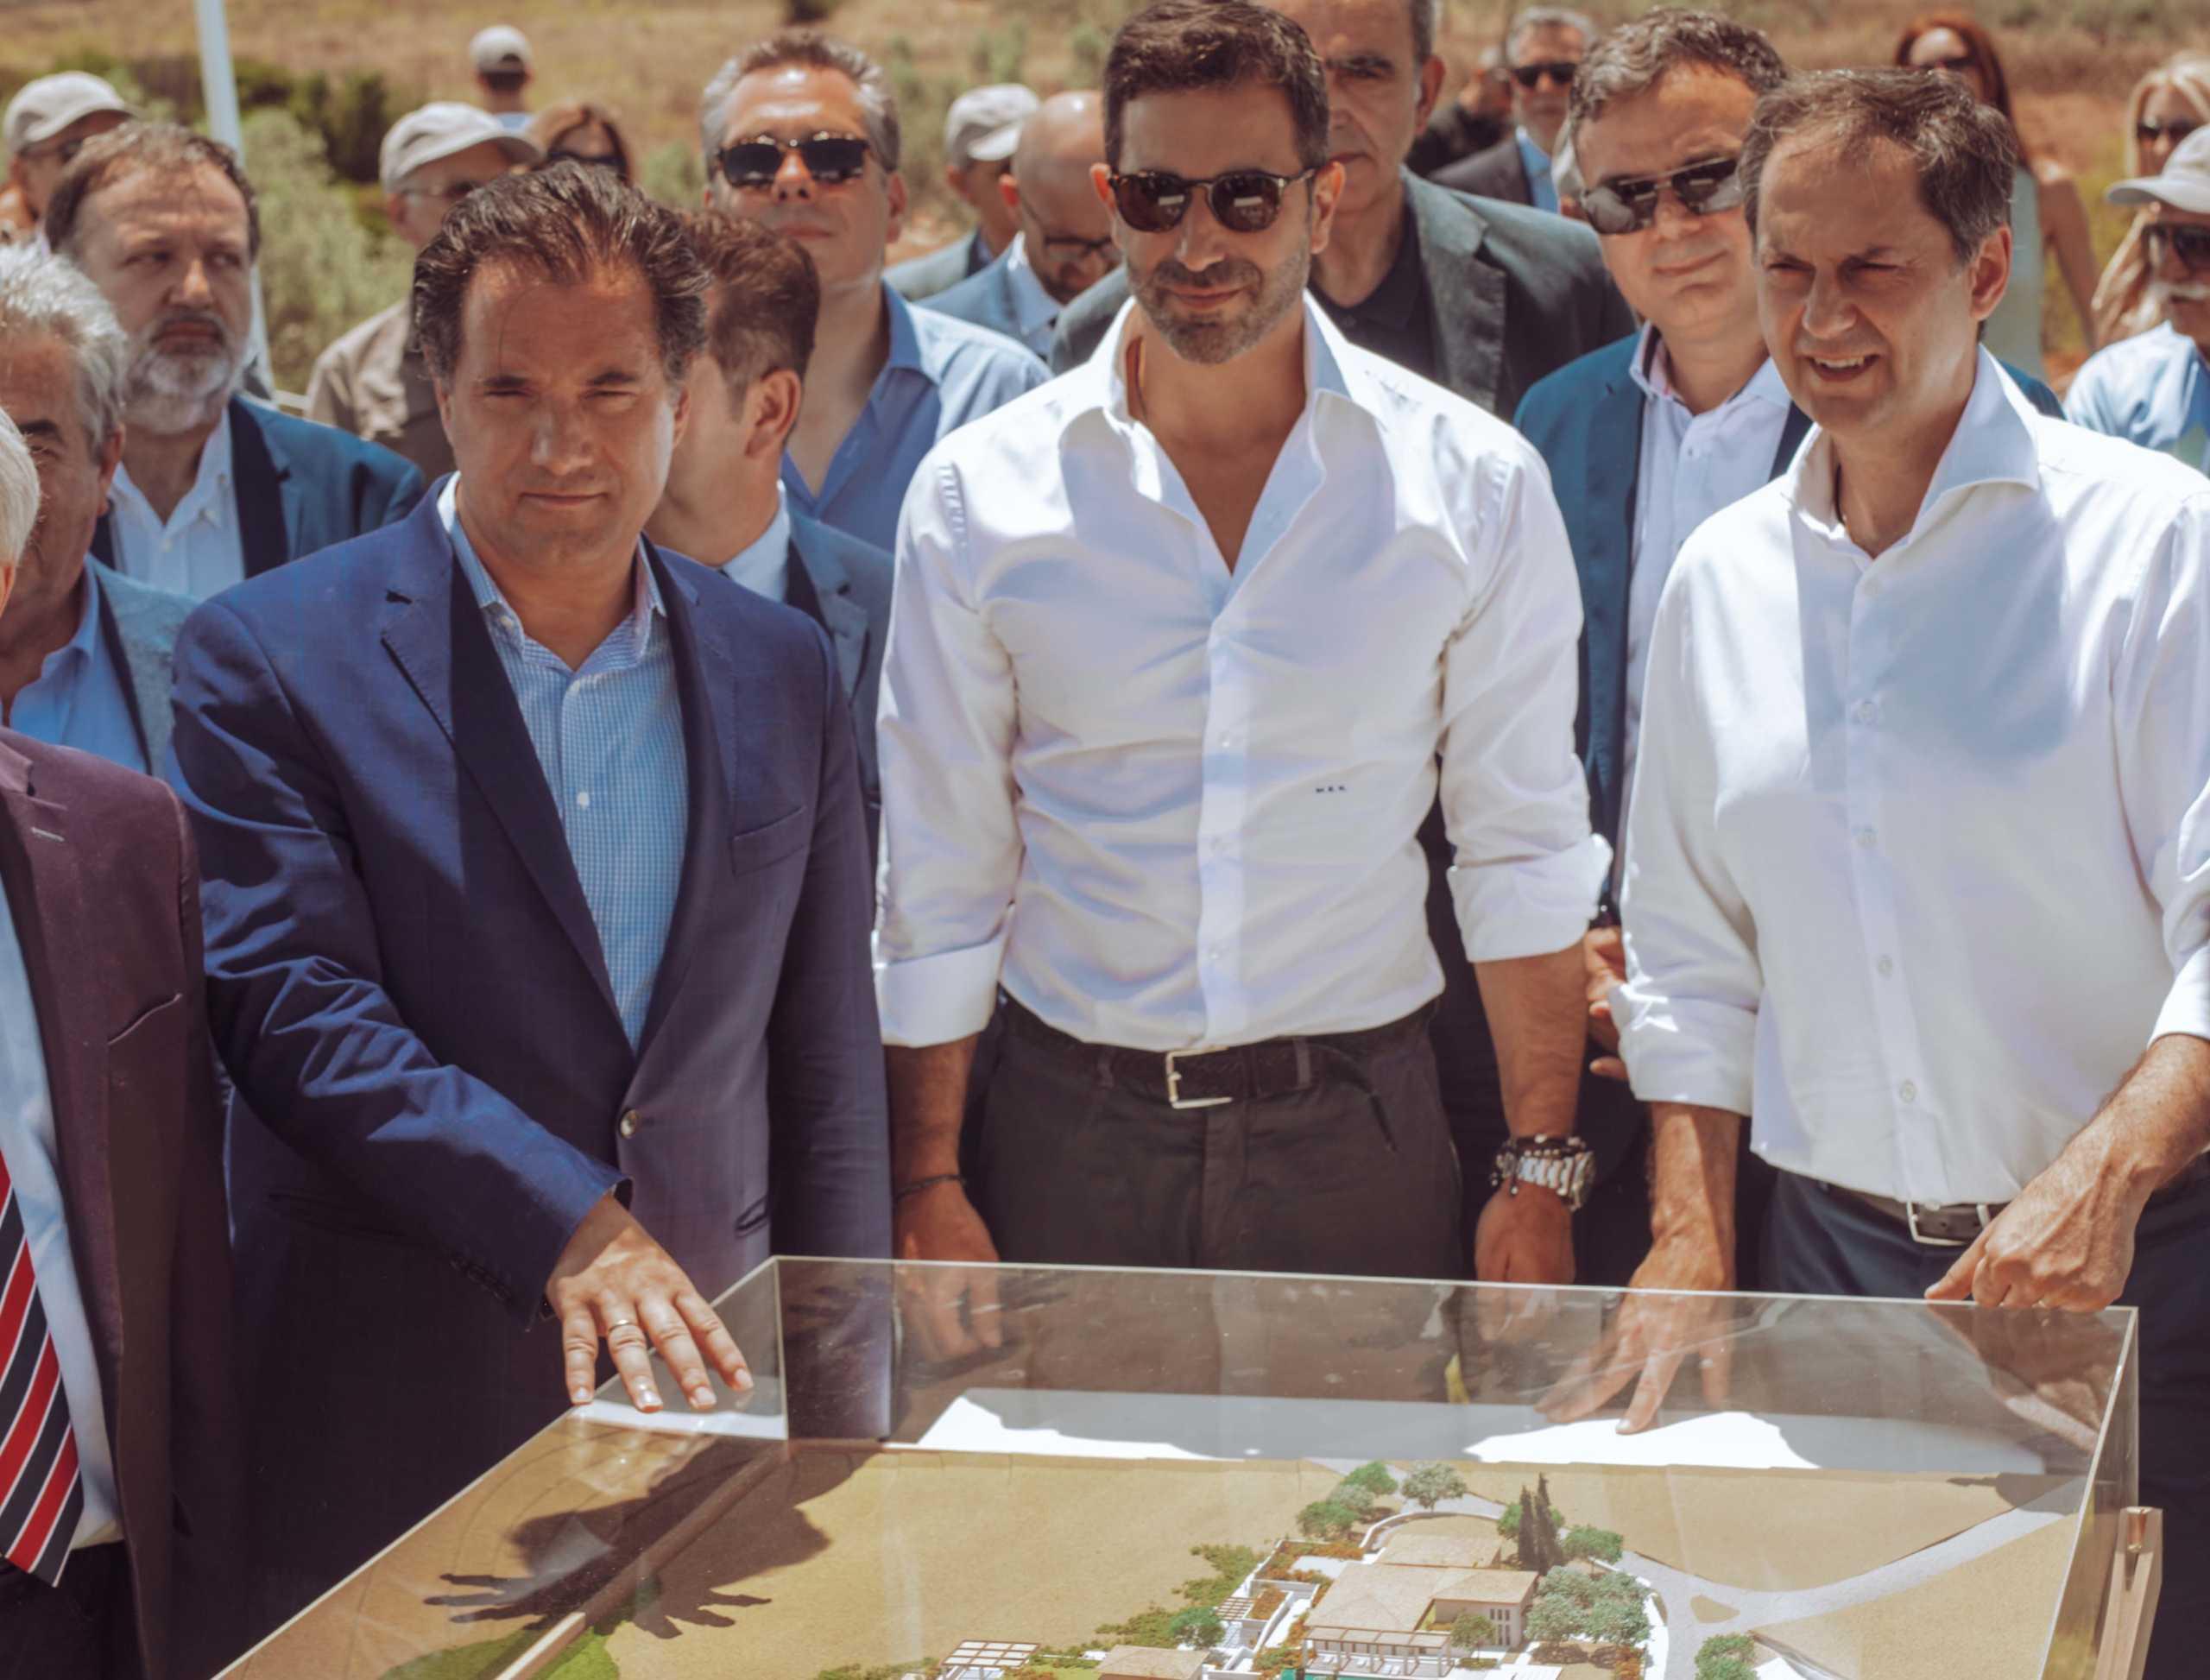 Dolphin Capital: Θεμελίωσε το τουριστικό συγκρότημα Kilada Country Club Golf & Residences στην Αργολίδα, προϋπολογισμού 400 εκατ. ευρώ